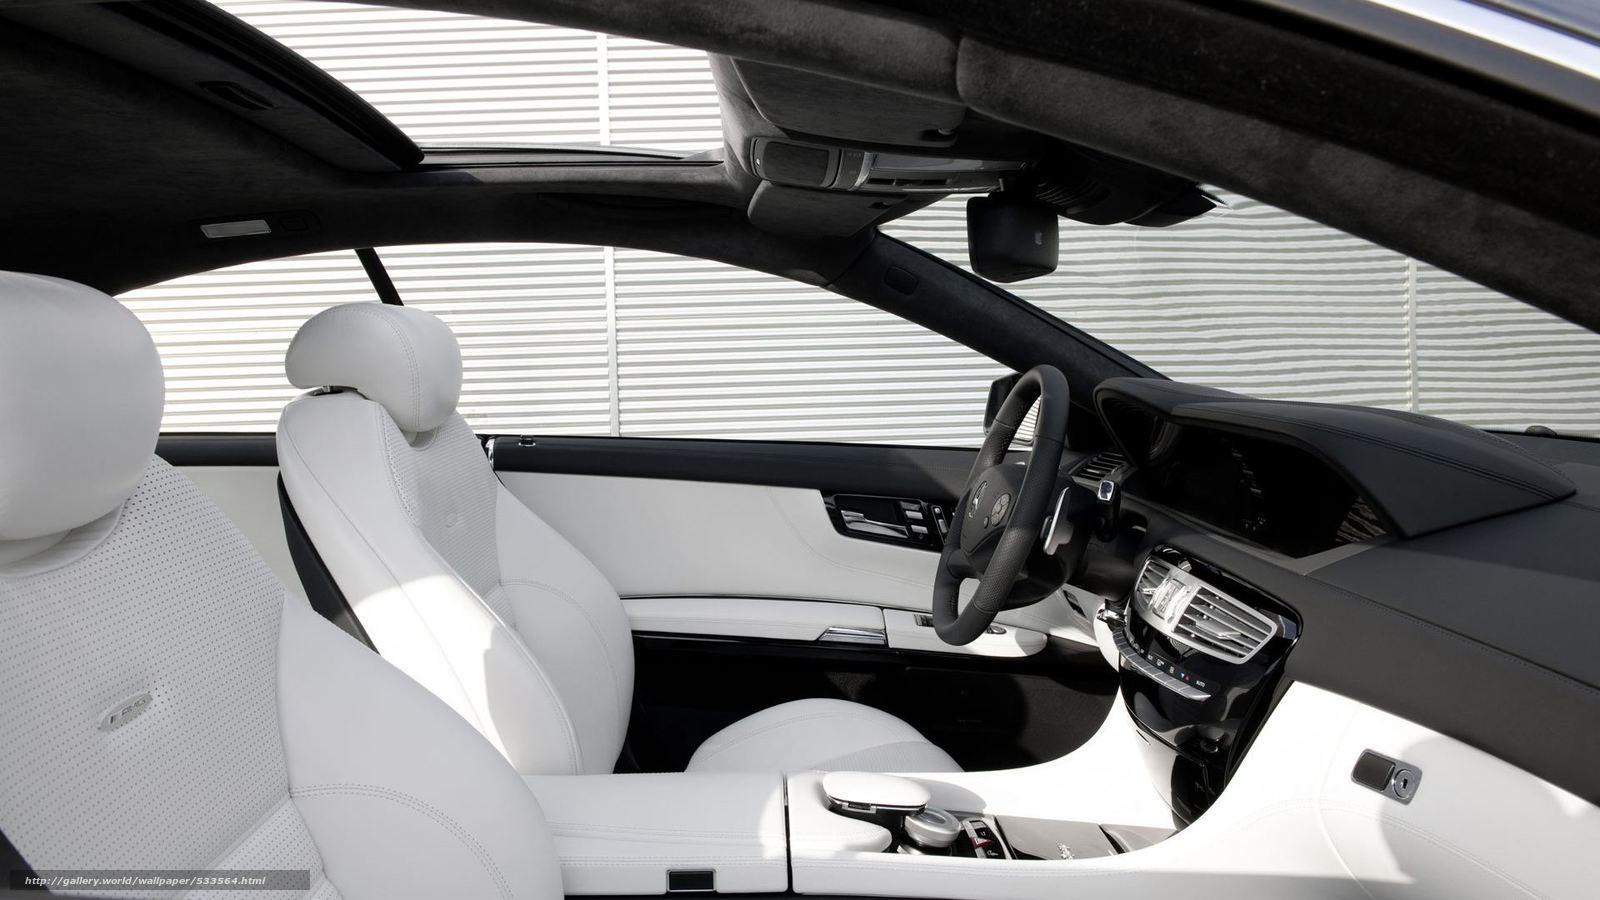 Download wallpaper mercedes salon white free desktop for Mercedes salon